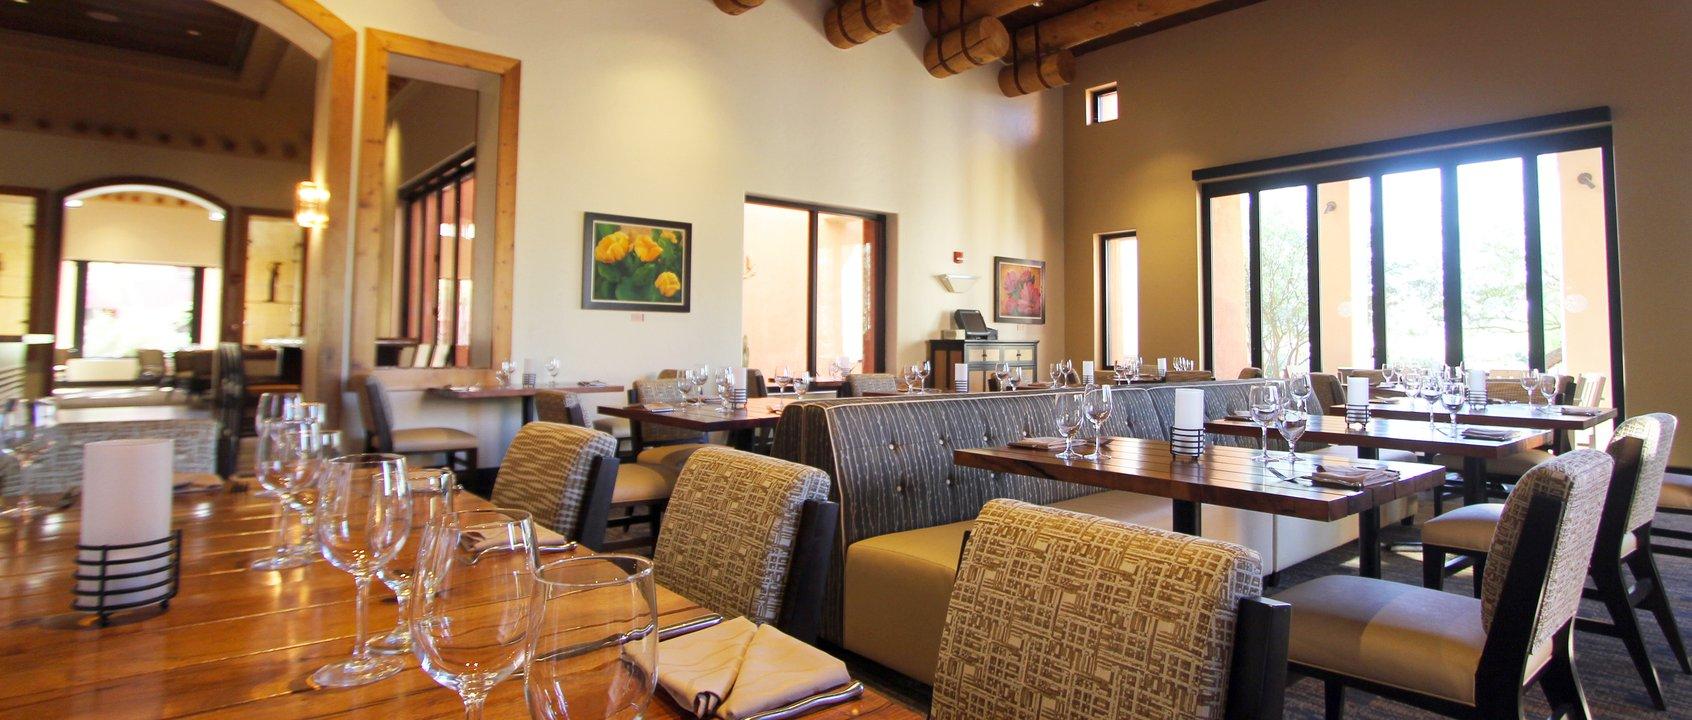 Restaurant Kitchen Pass ko'sin restaurant, sheraton wild horse pass | jcj architecture